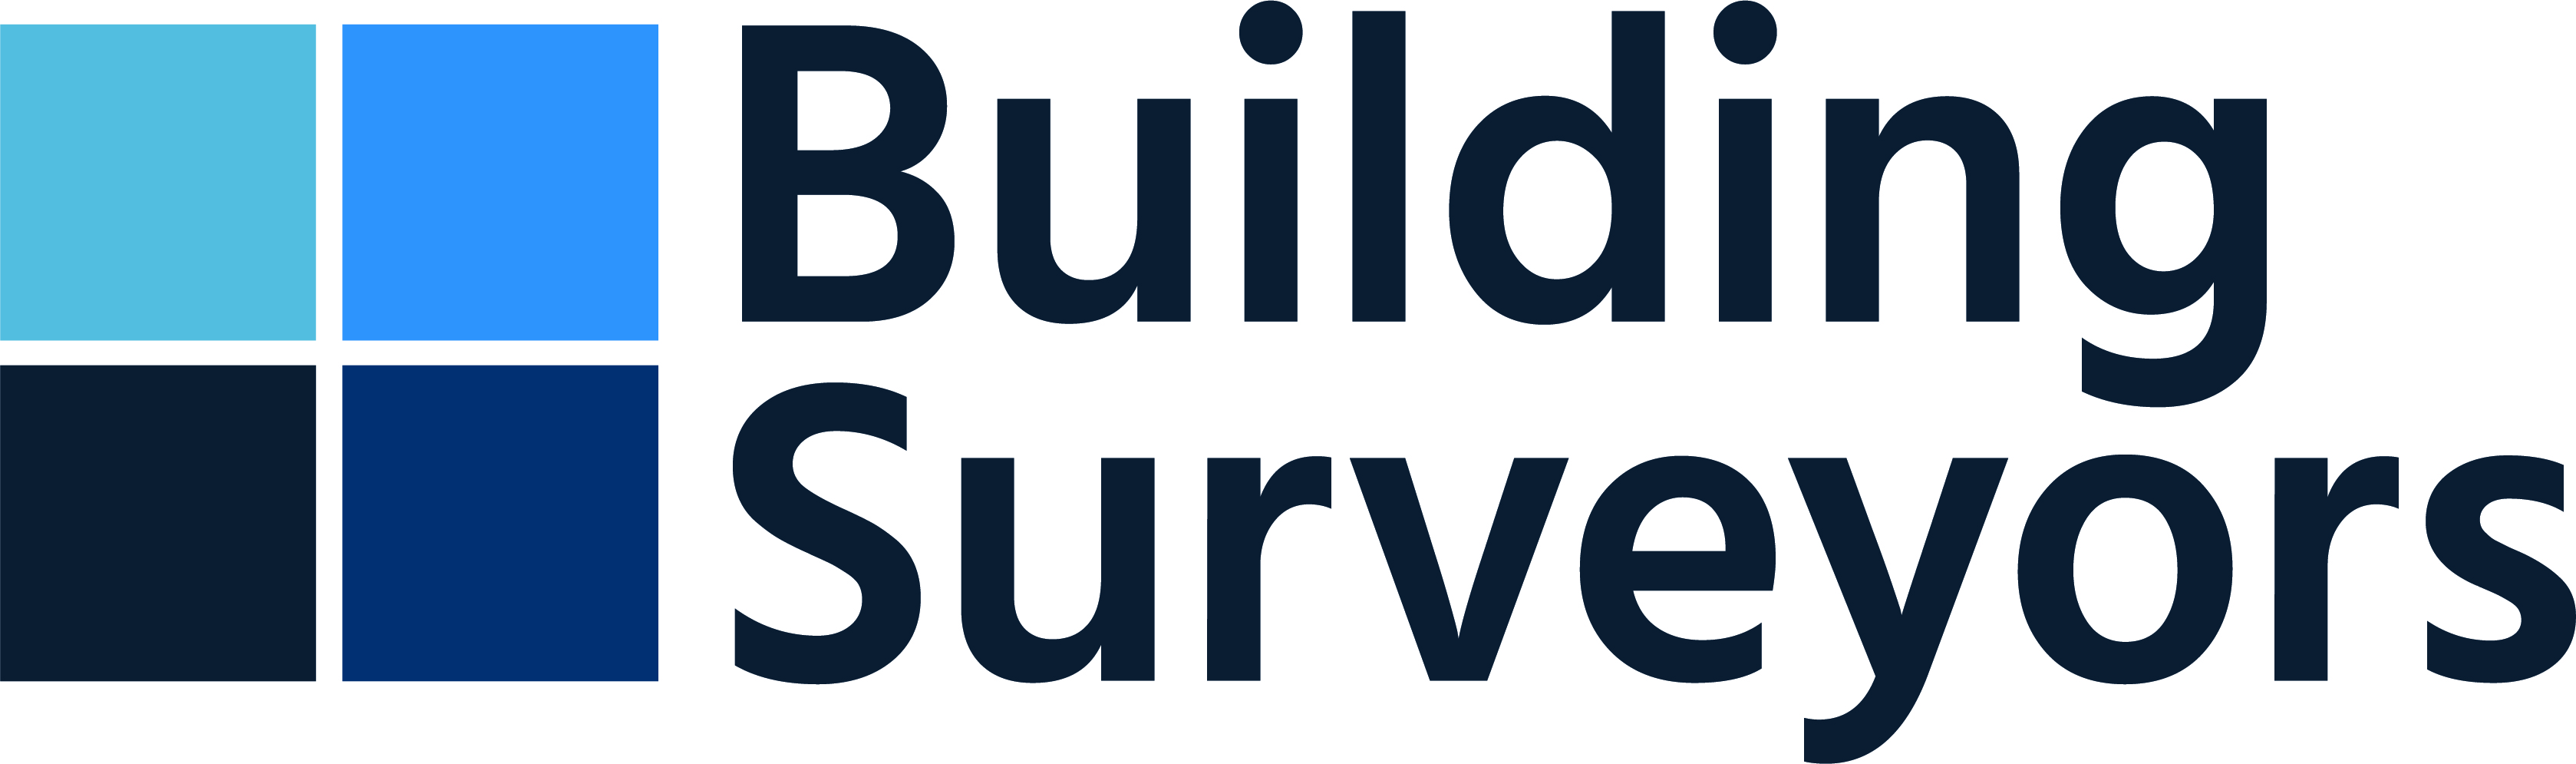 building_surveyors_logo